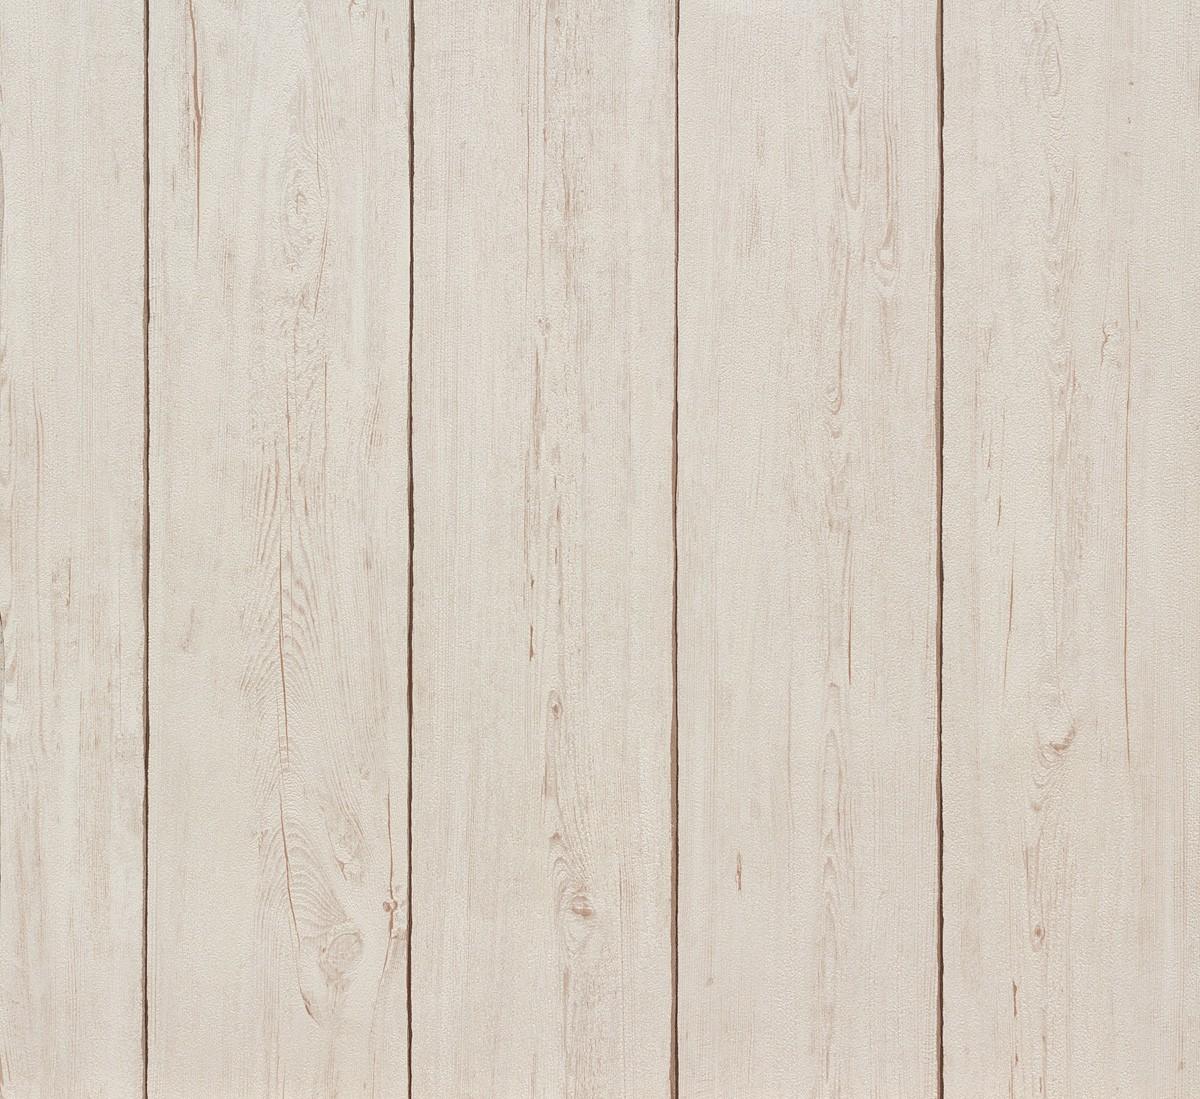 tapete vlies holz optik creme beige marburg attitude 56211. Black Bedroom Furniture Sets. Home Design Ideas